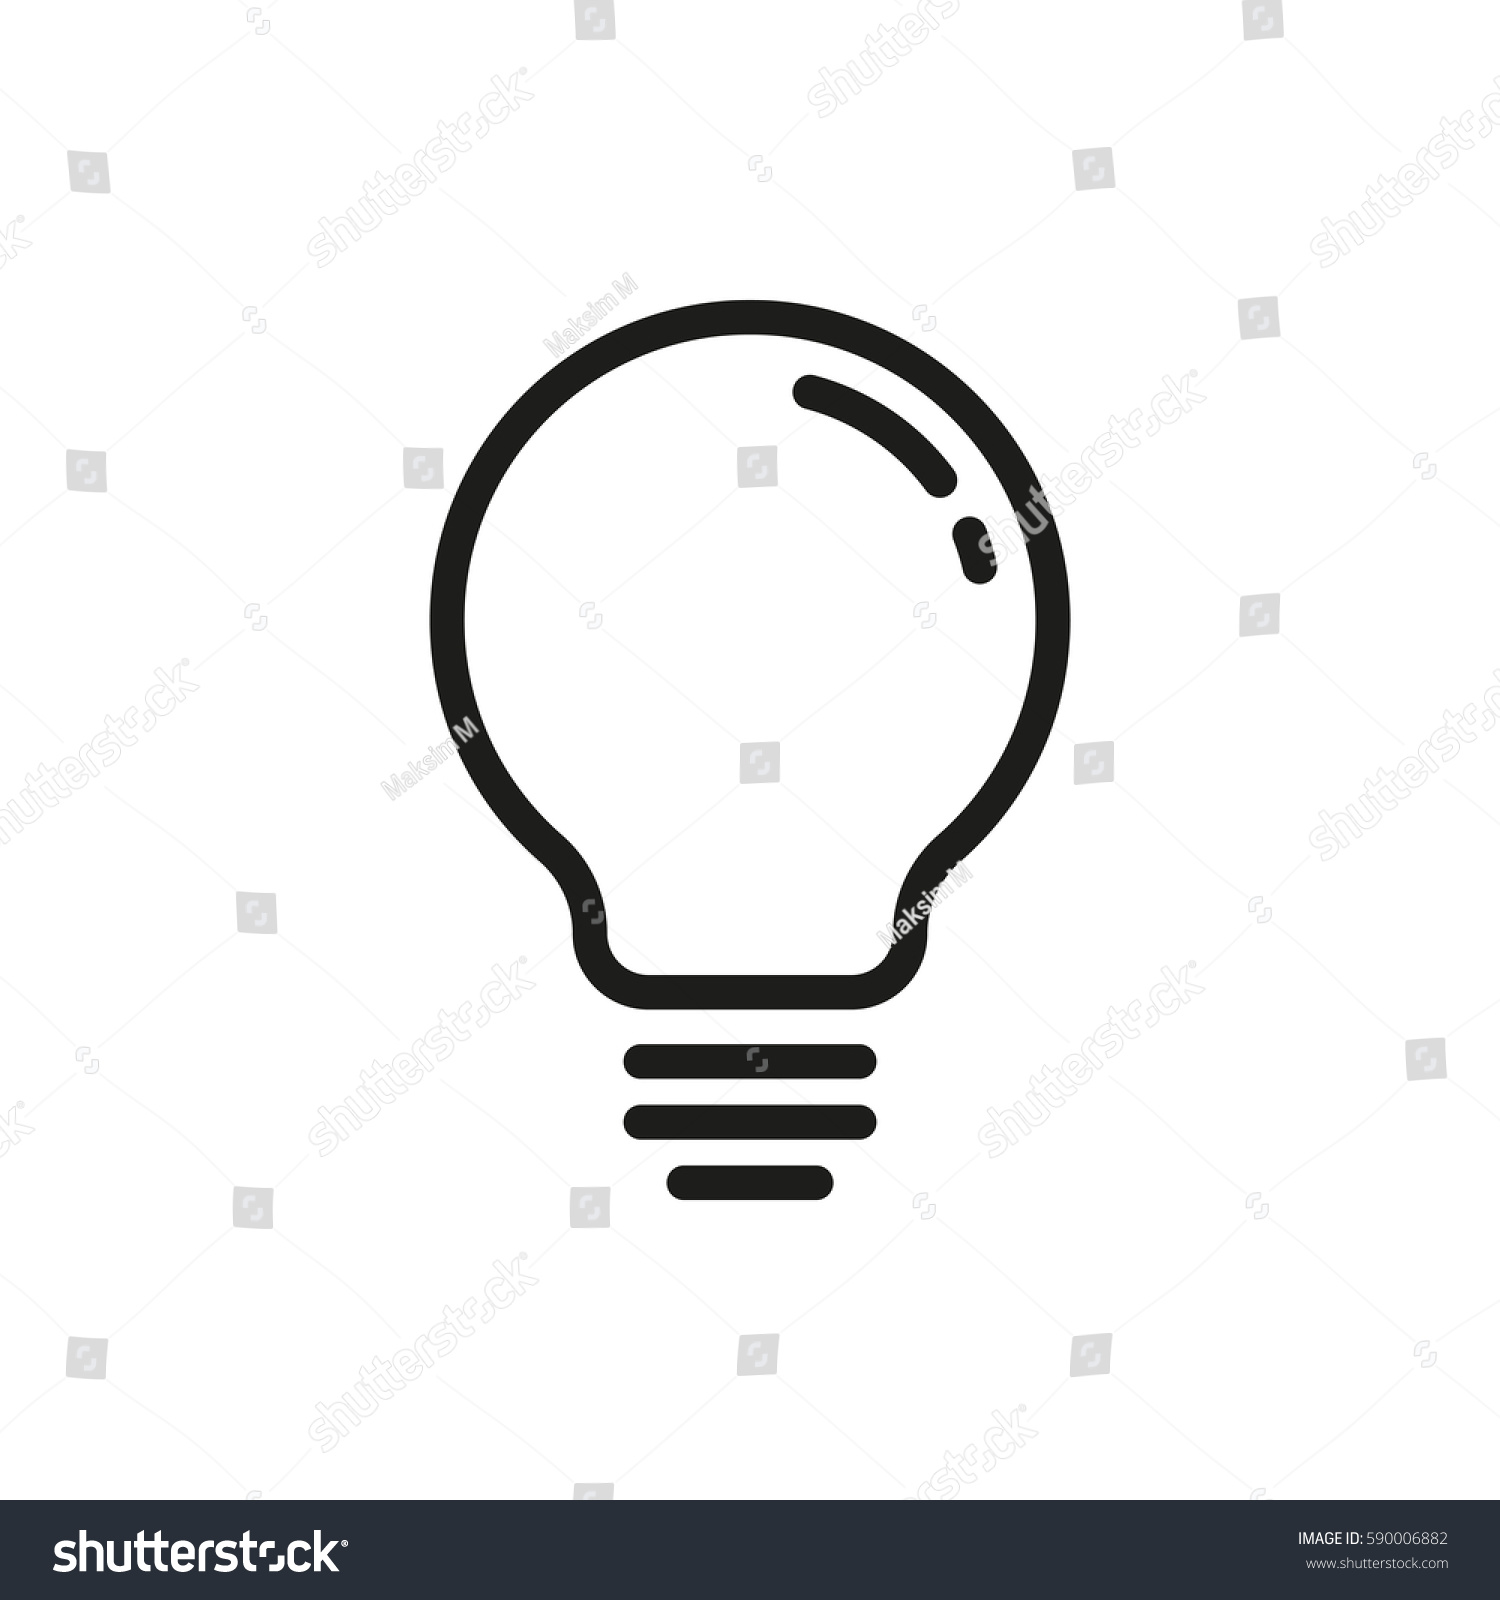 lightbulb vector icon stock vector 2018 590006882 shutterstock rh shutterstock com light bulb icon vector light bulb vector